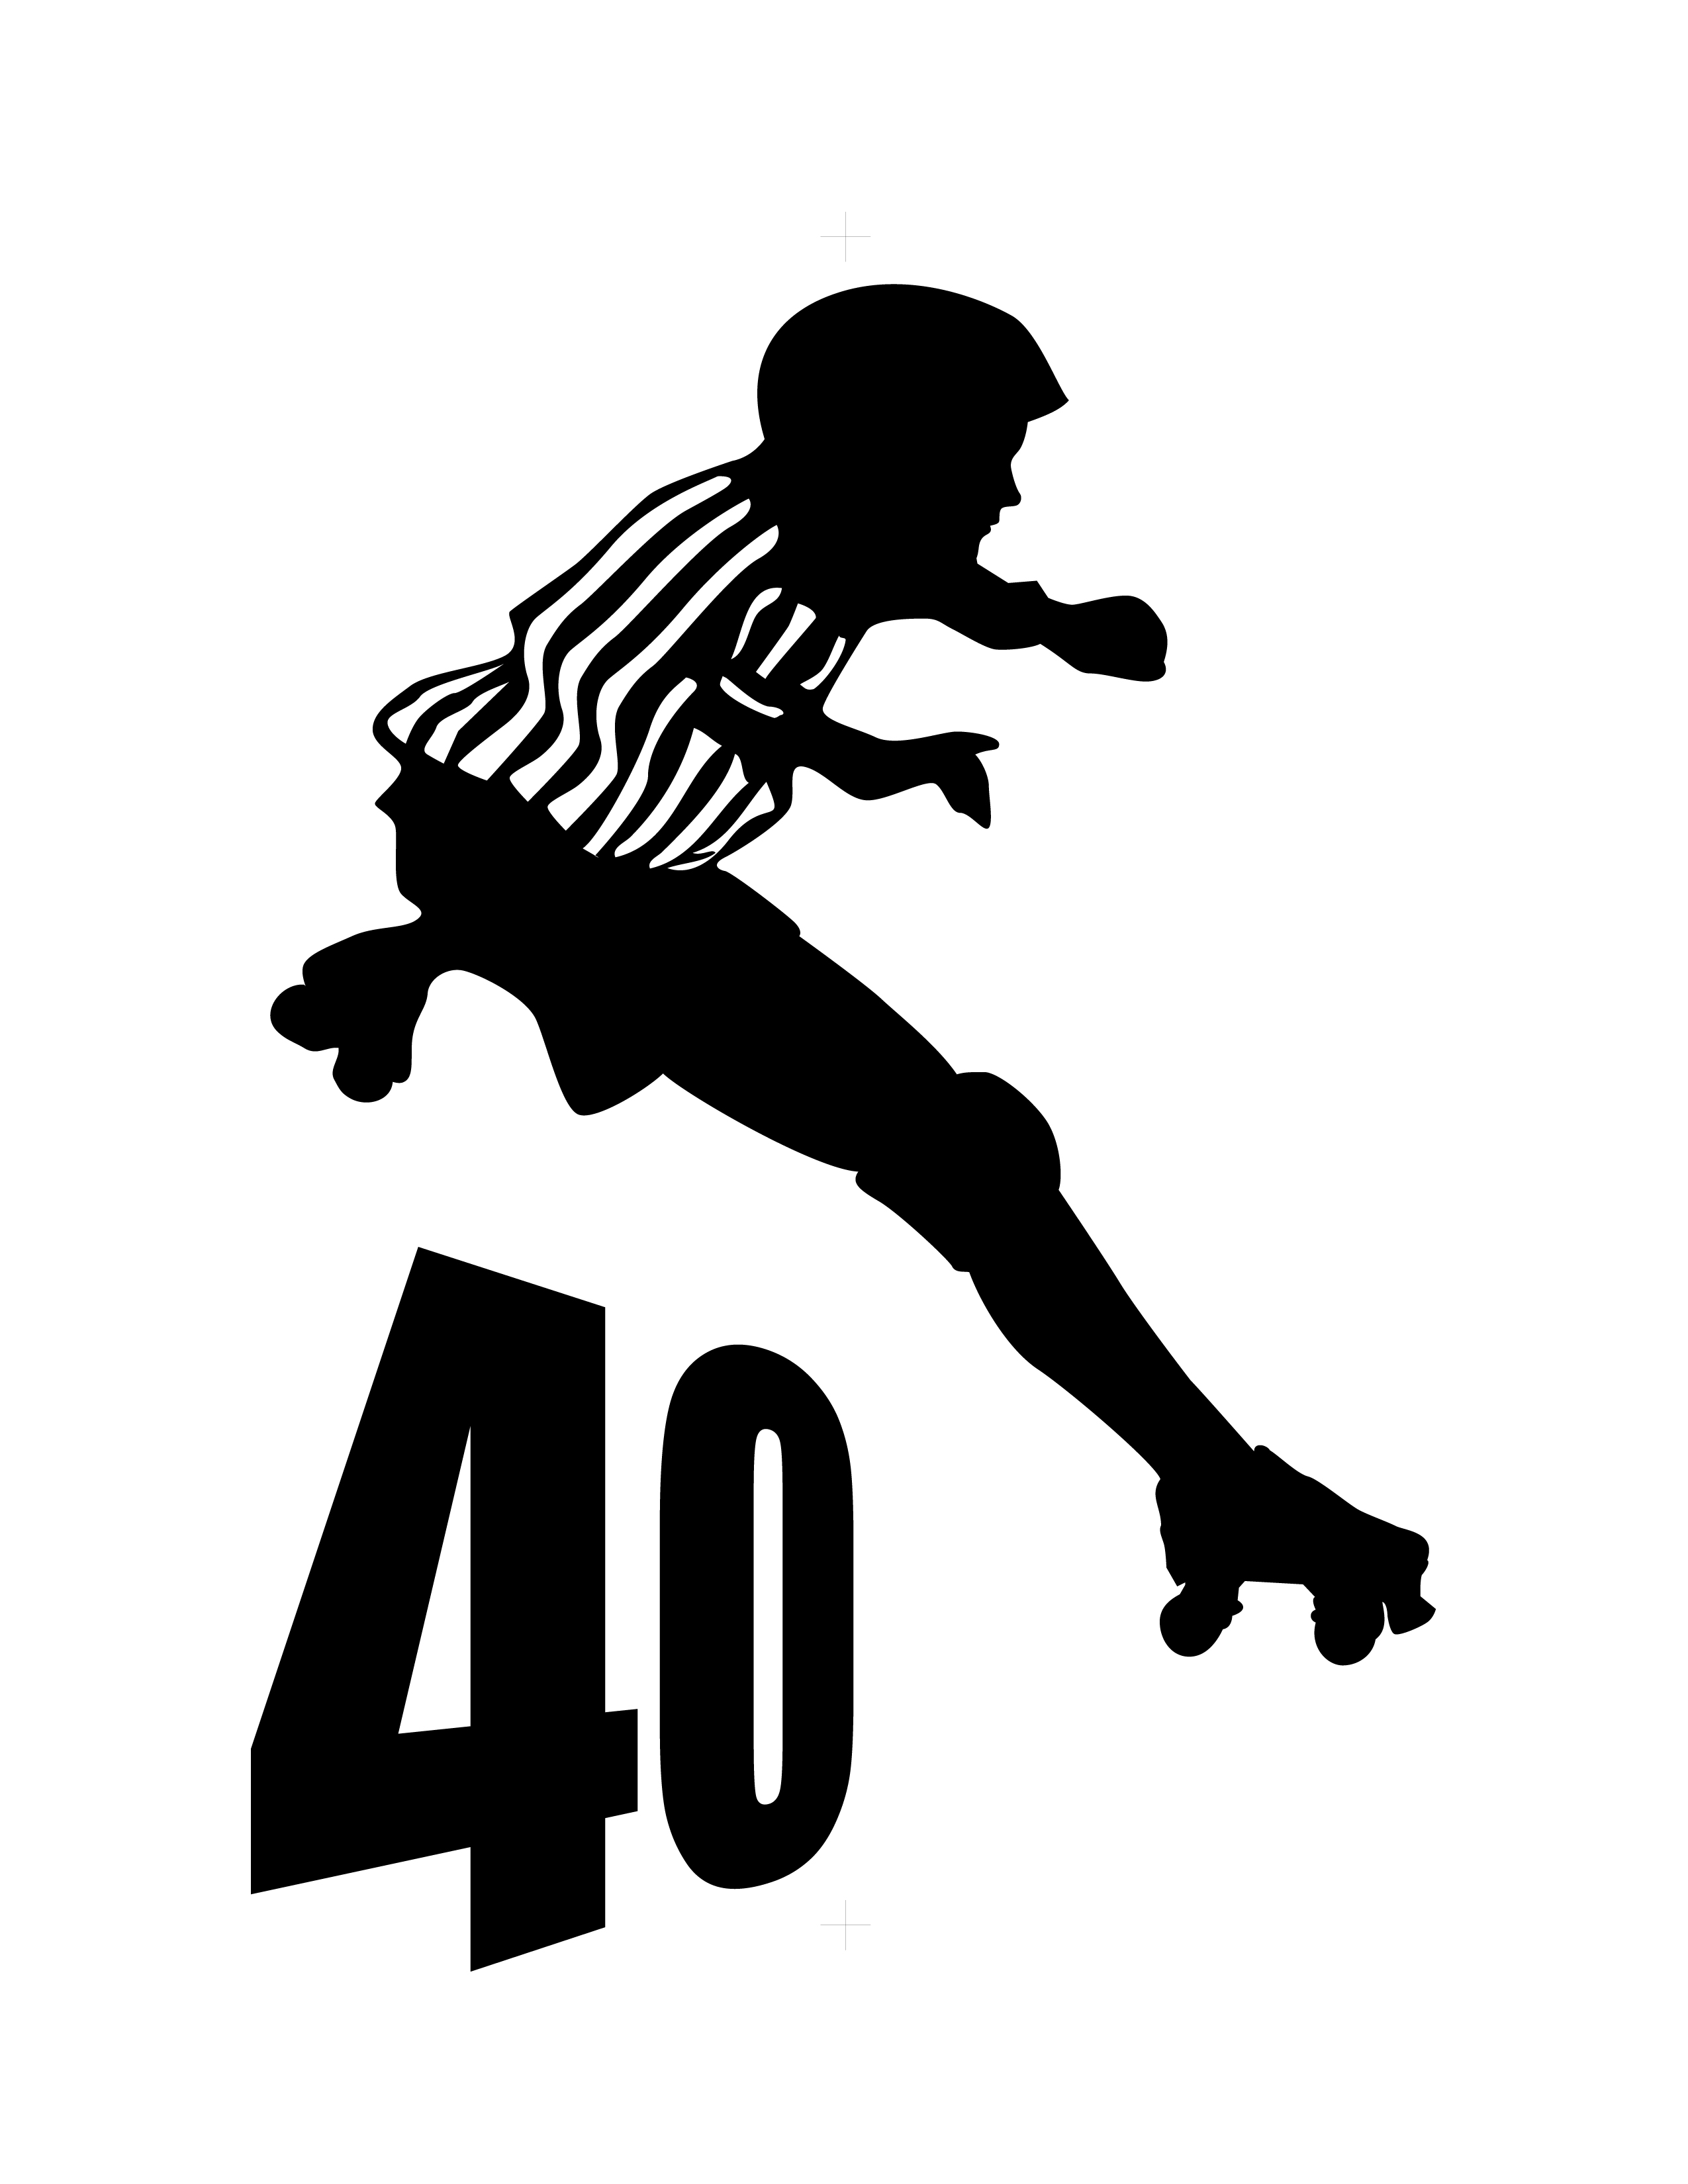 Zebra over 40